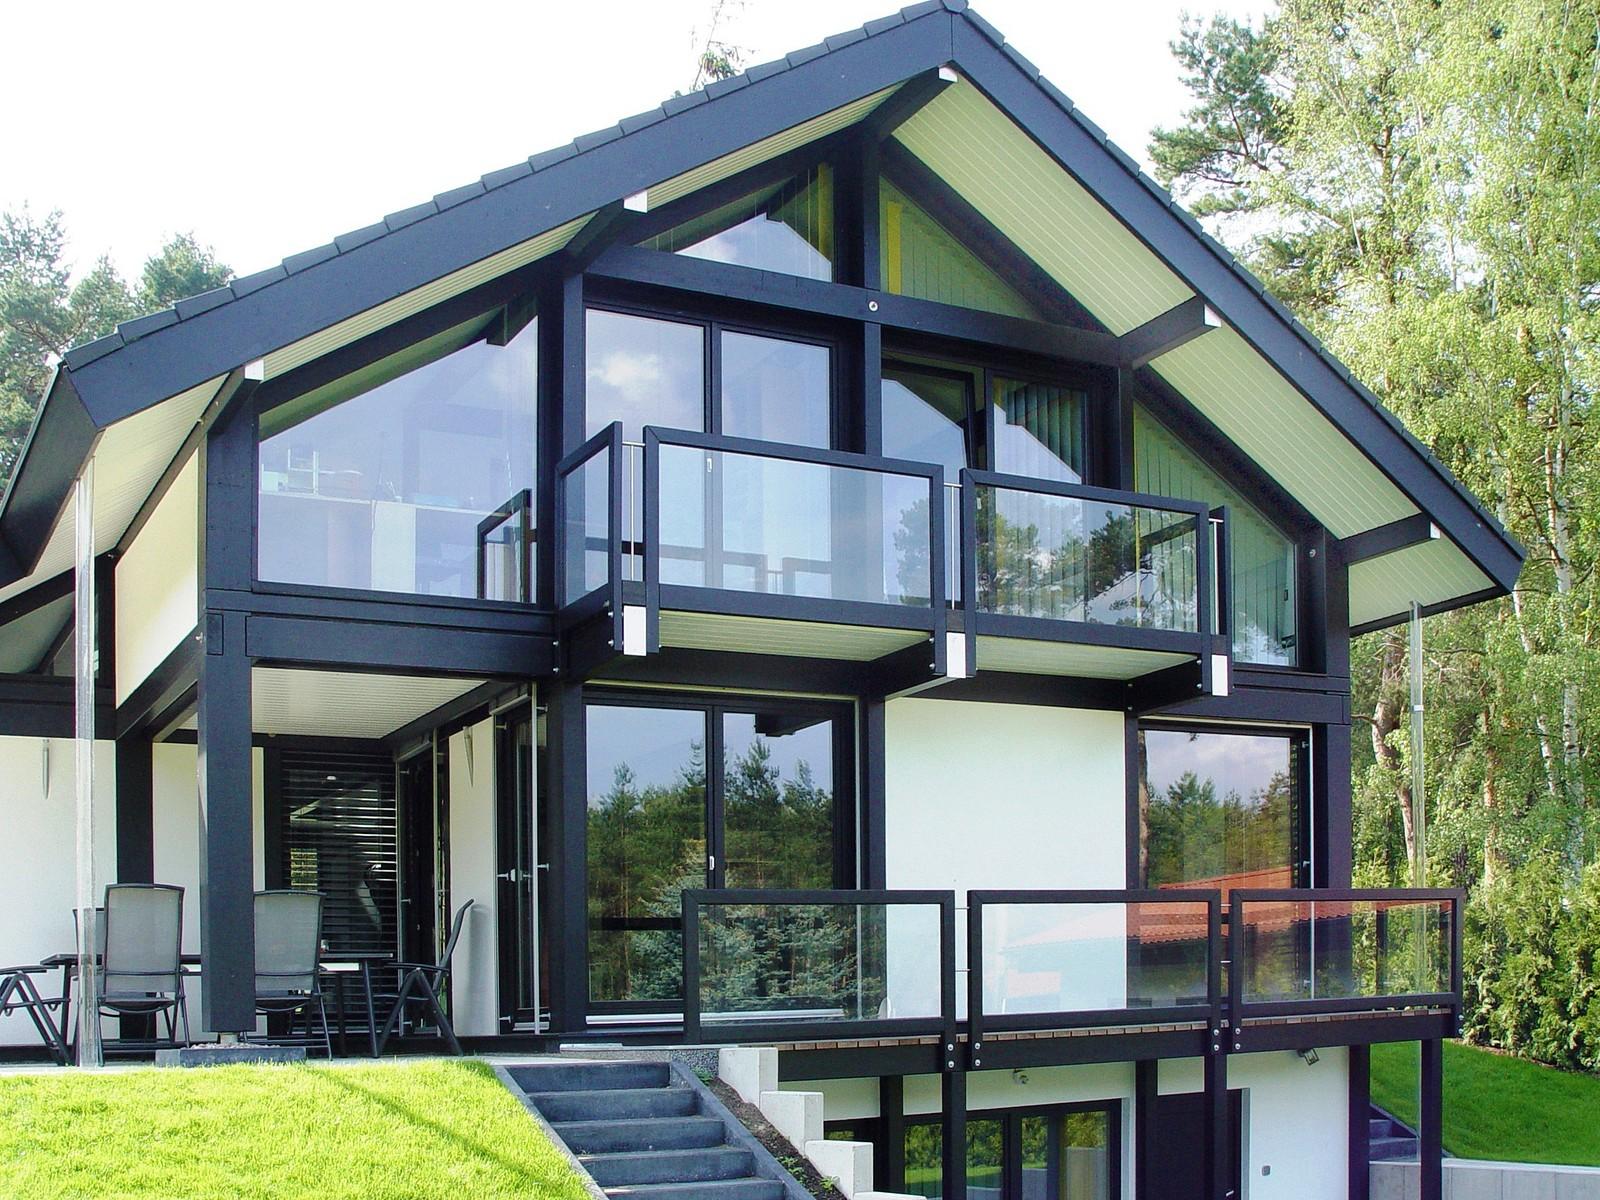 fachwerkhaus dunkle konstruktion holz skelett haus landhaus 18 concentus moderne fachwerkh user. Black Bedroom Furniture Sets. Home Design Ideas